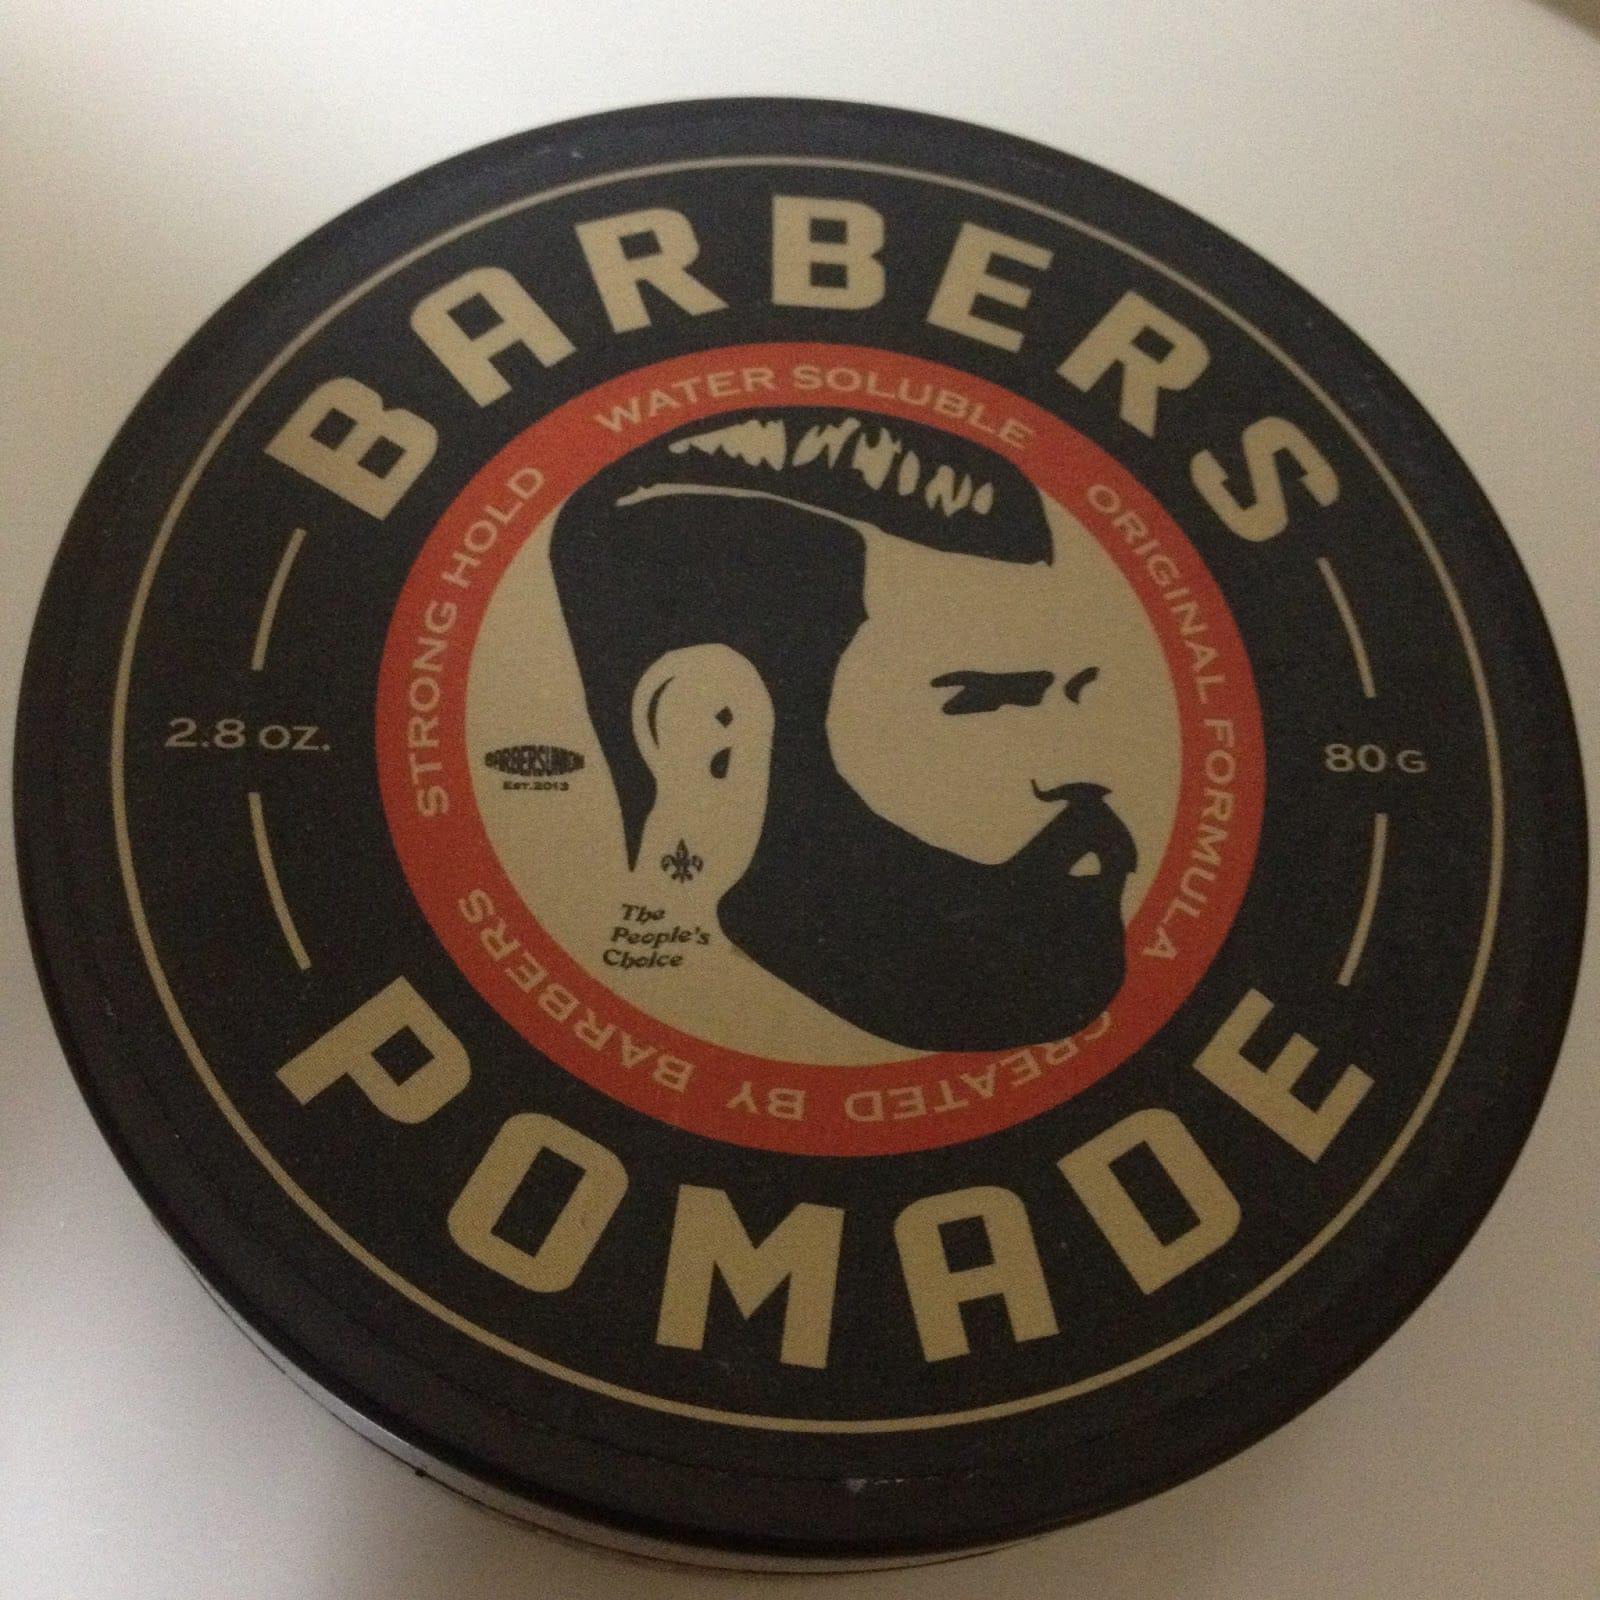 Barbers-pomade